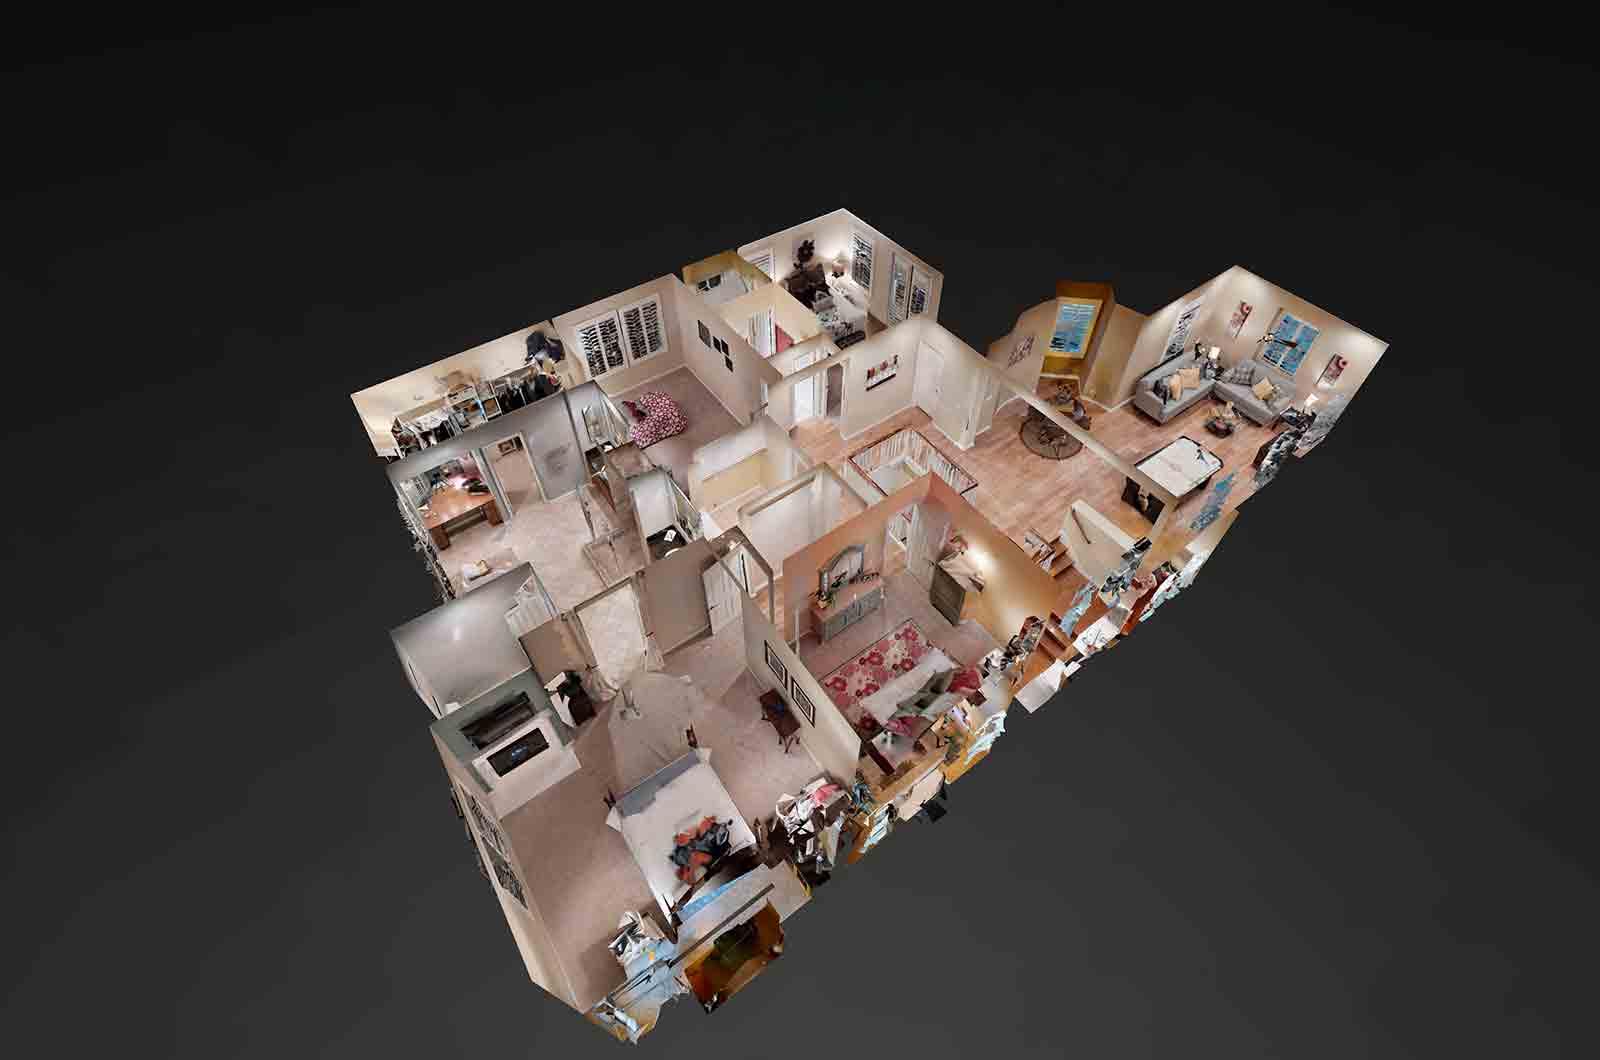 Immersive-3D-Tours-Matterport-Orange-County